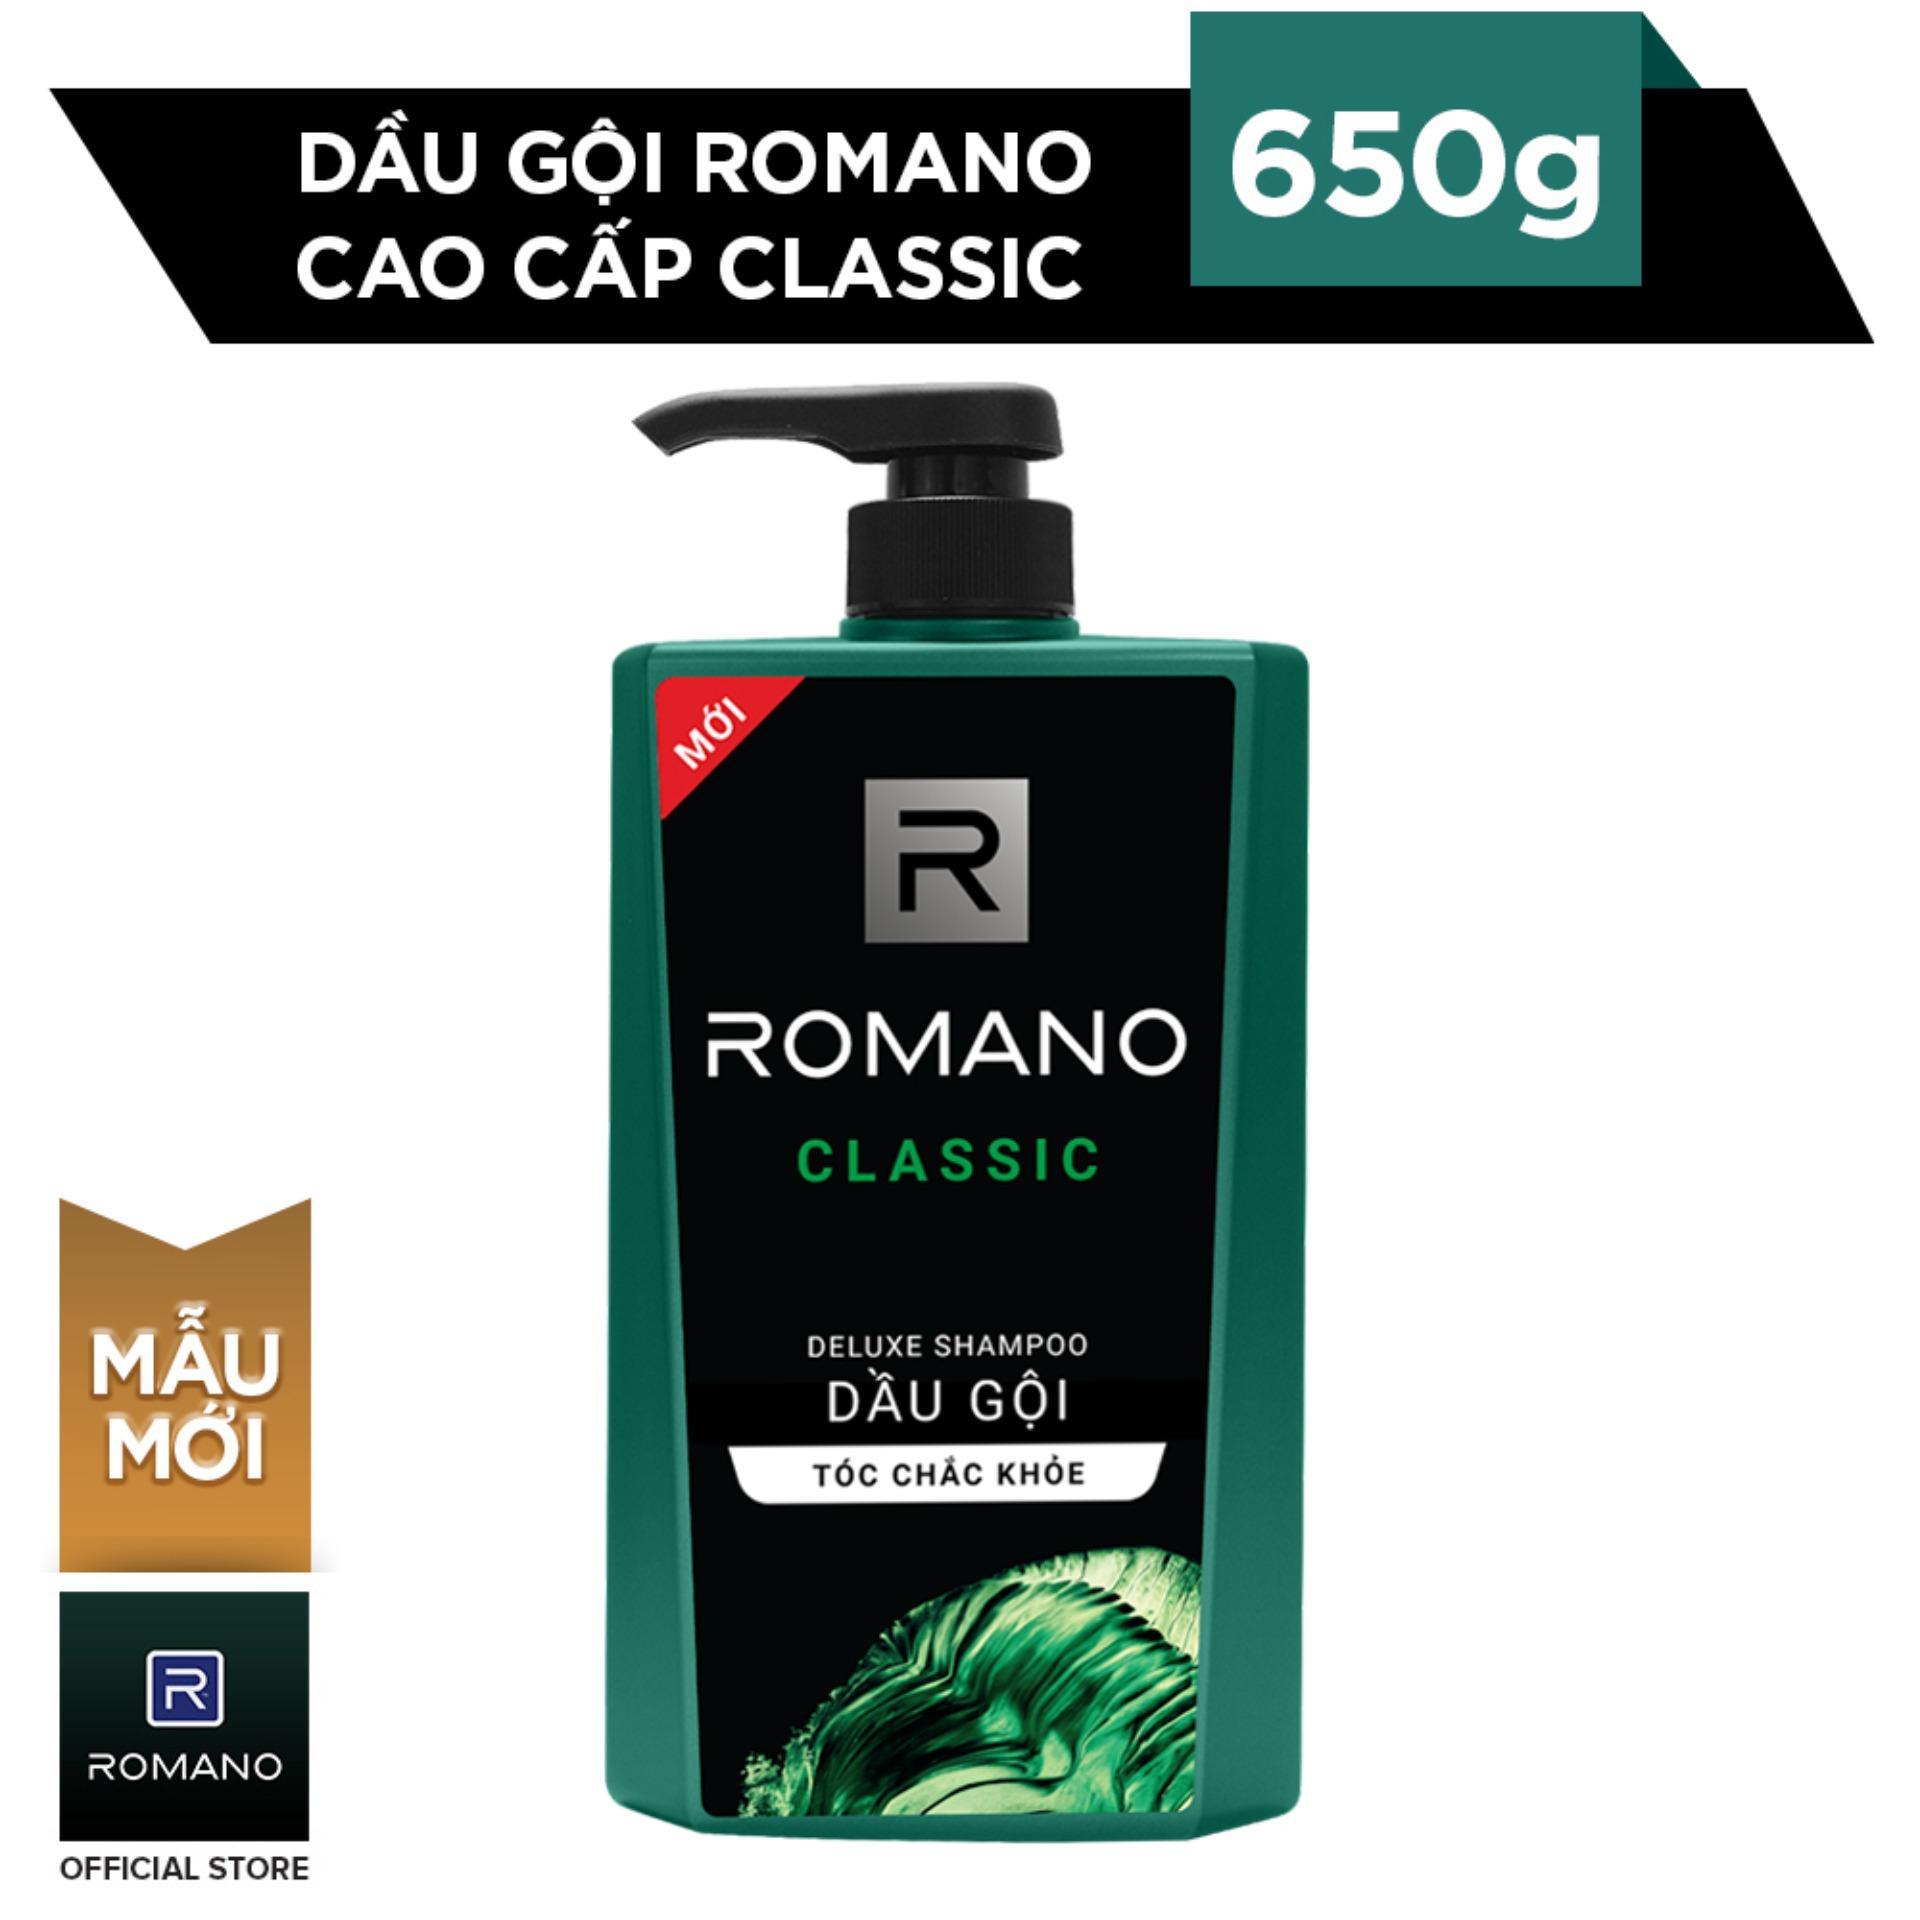 Romano Dầu Gội Cao Cấp Classic 650g